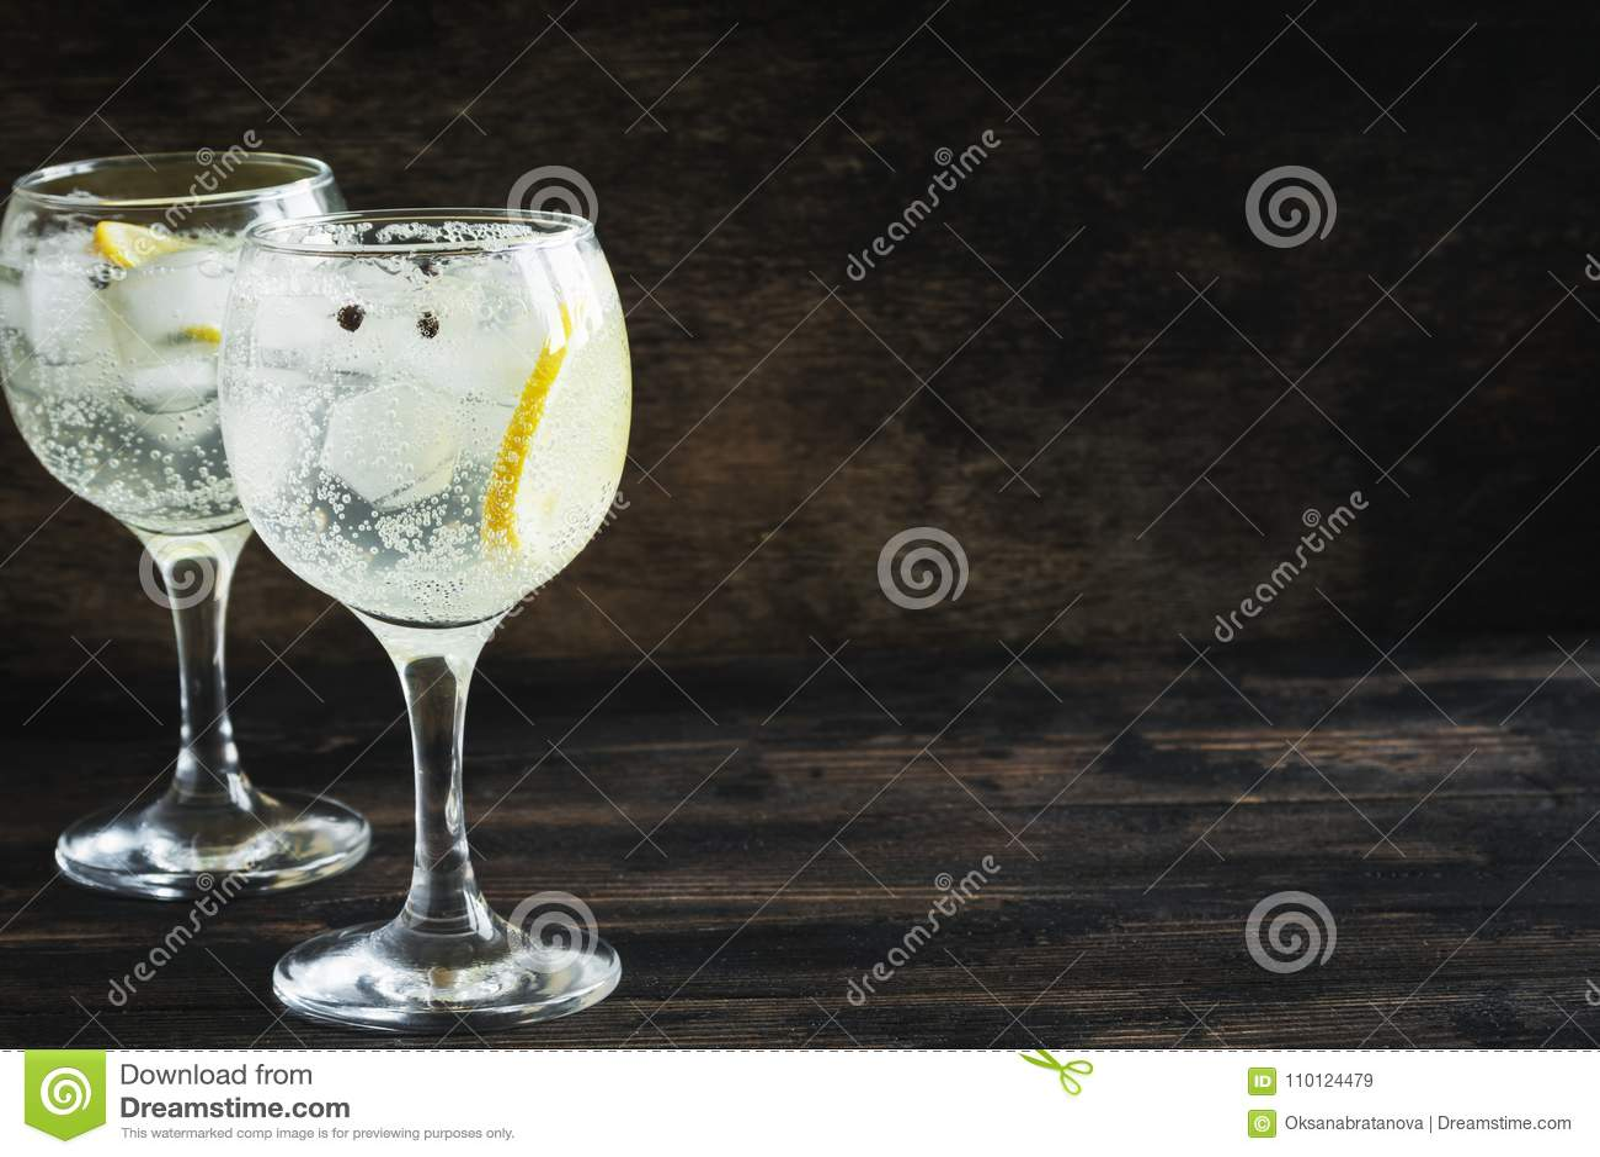 Gin- och uppiggningsmedelcoctail